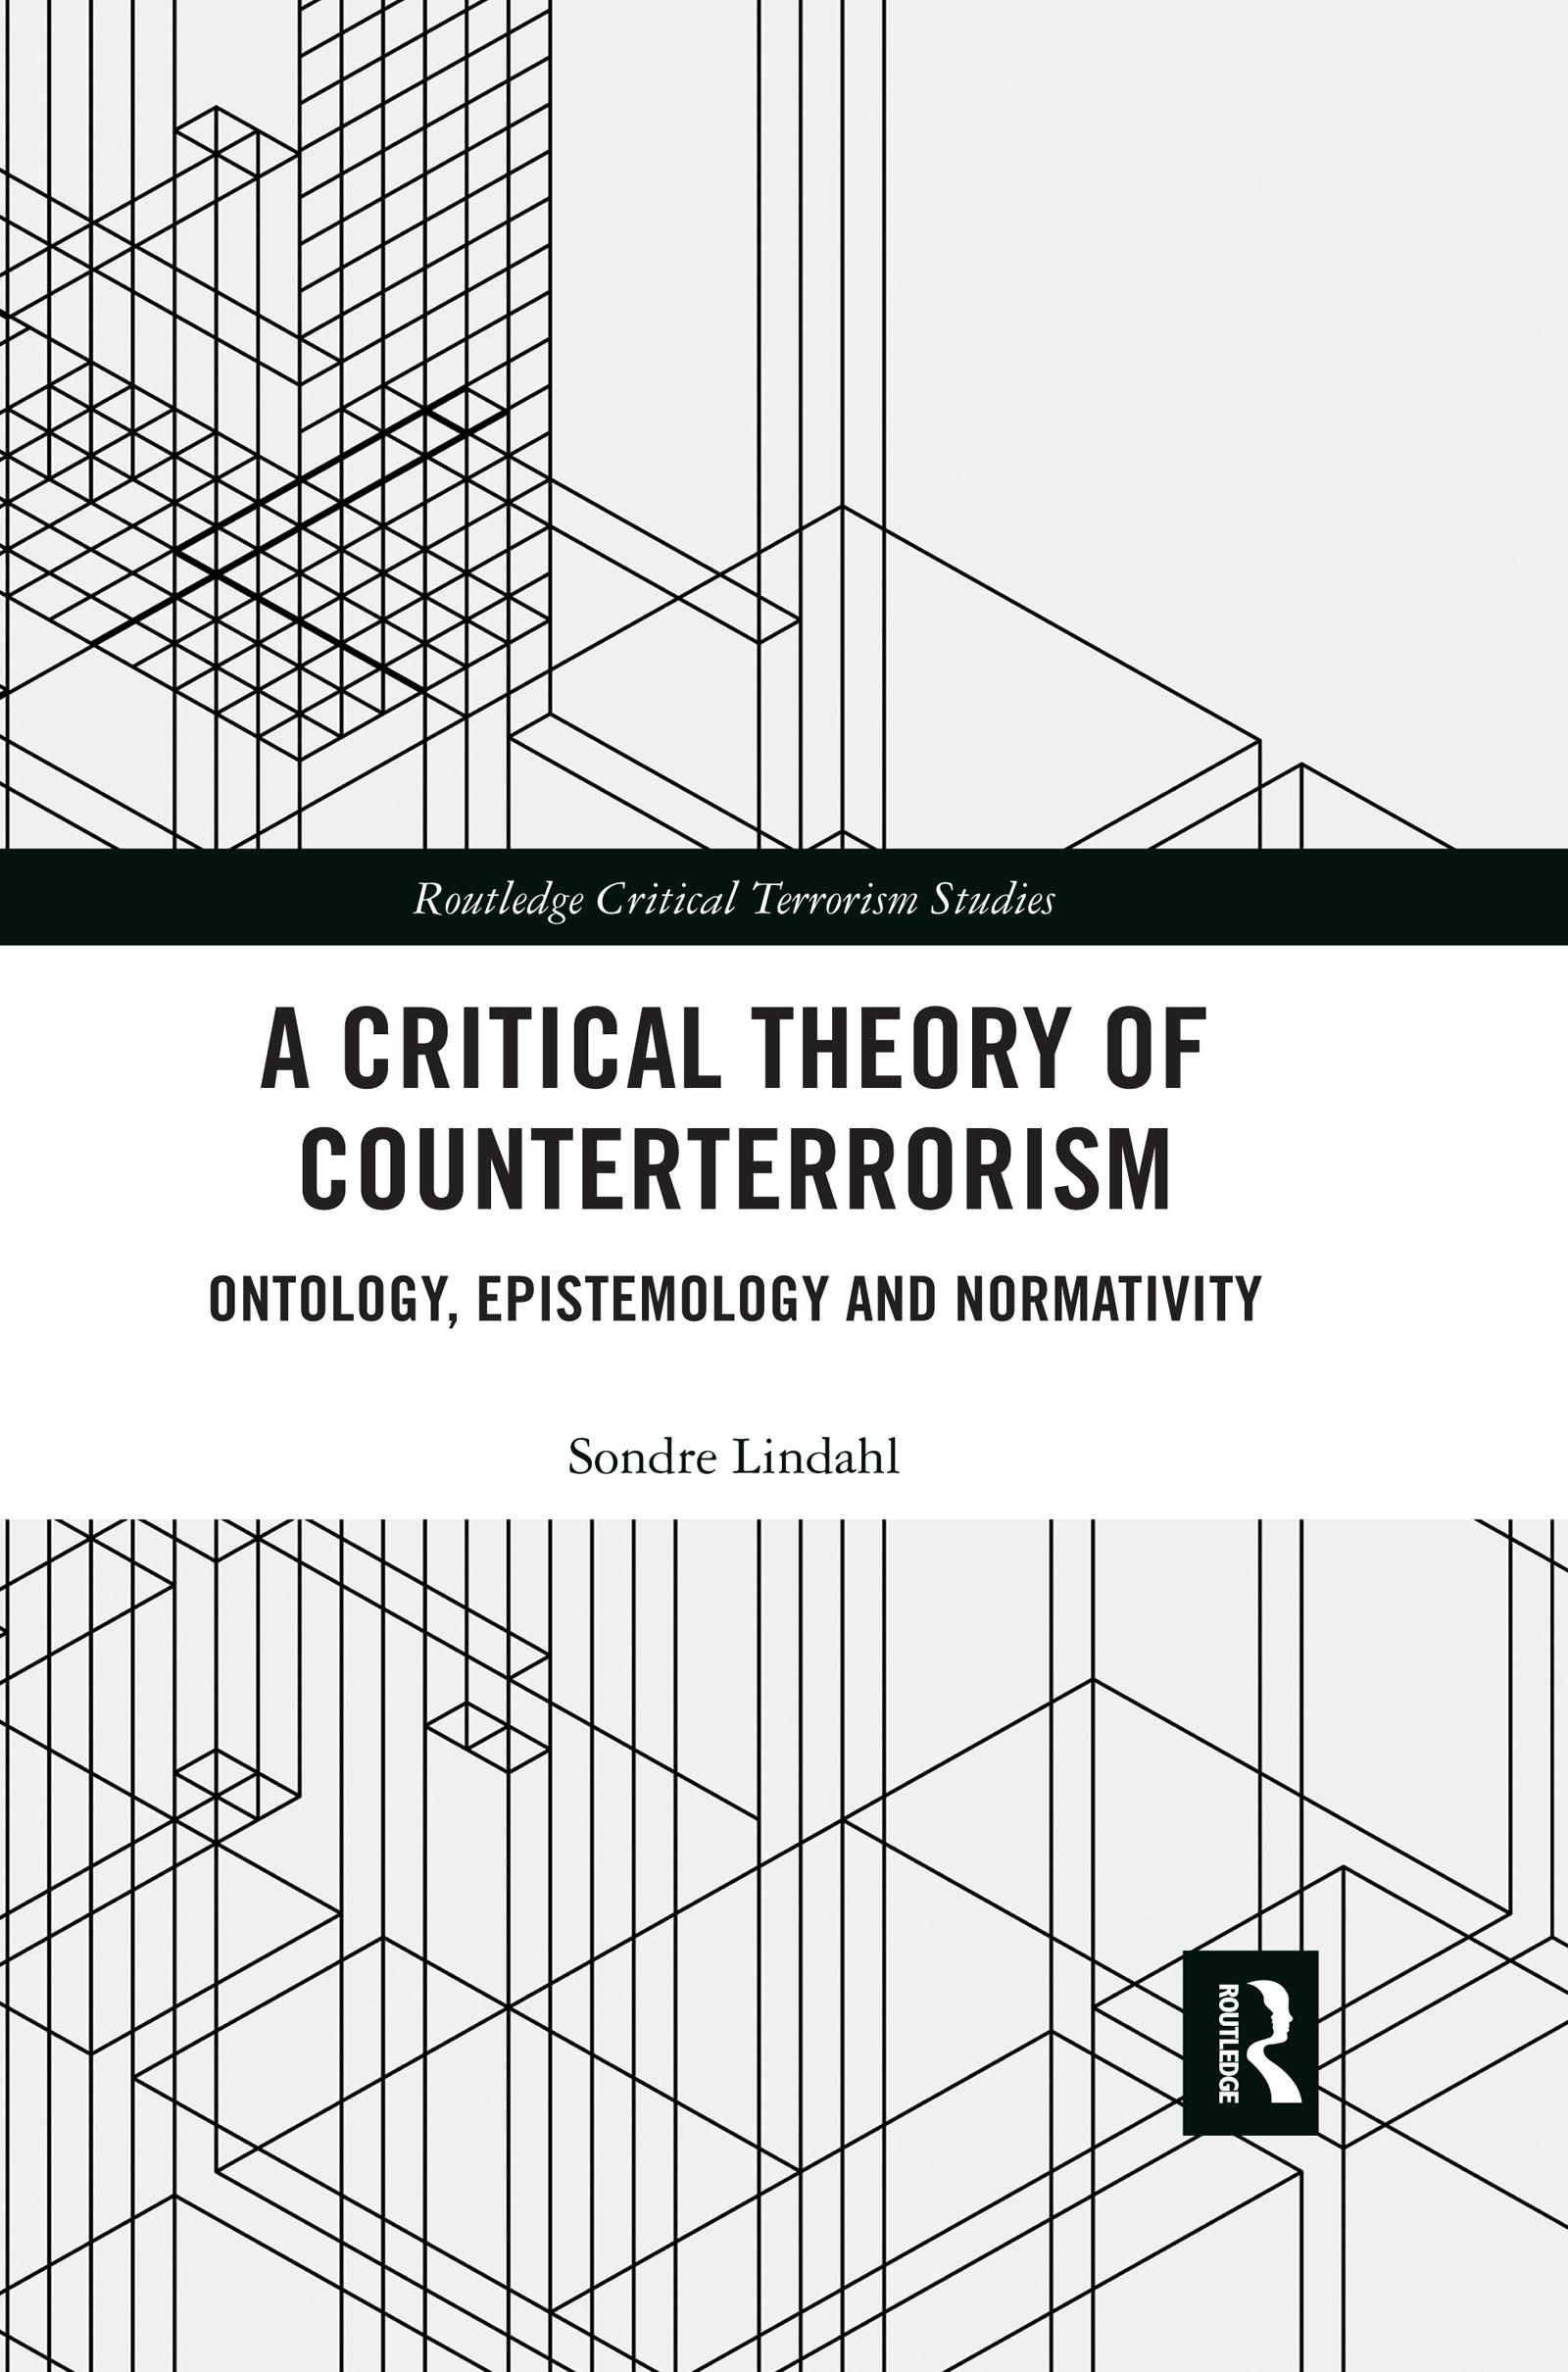 A Critical Theory of Counterterrorism